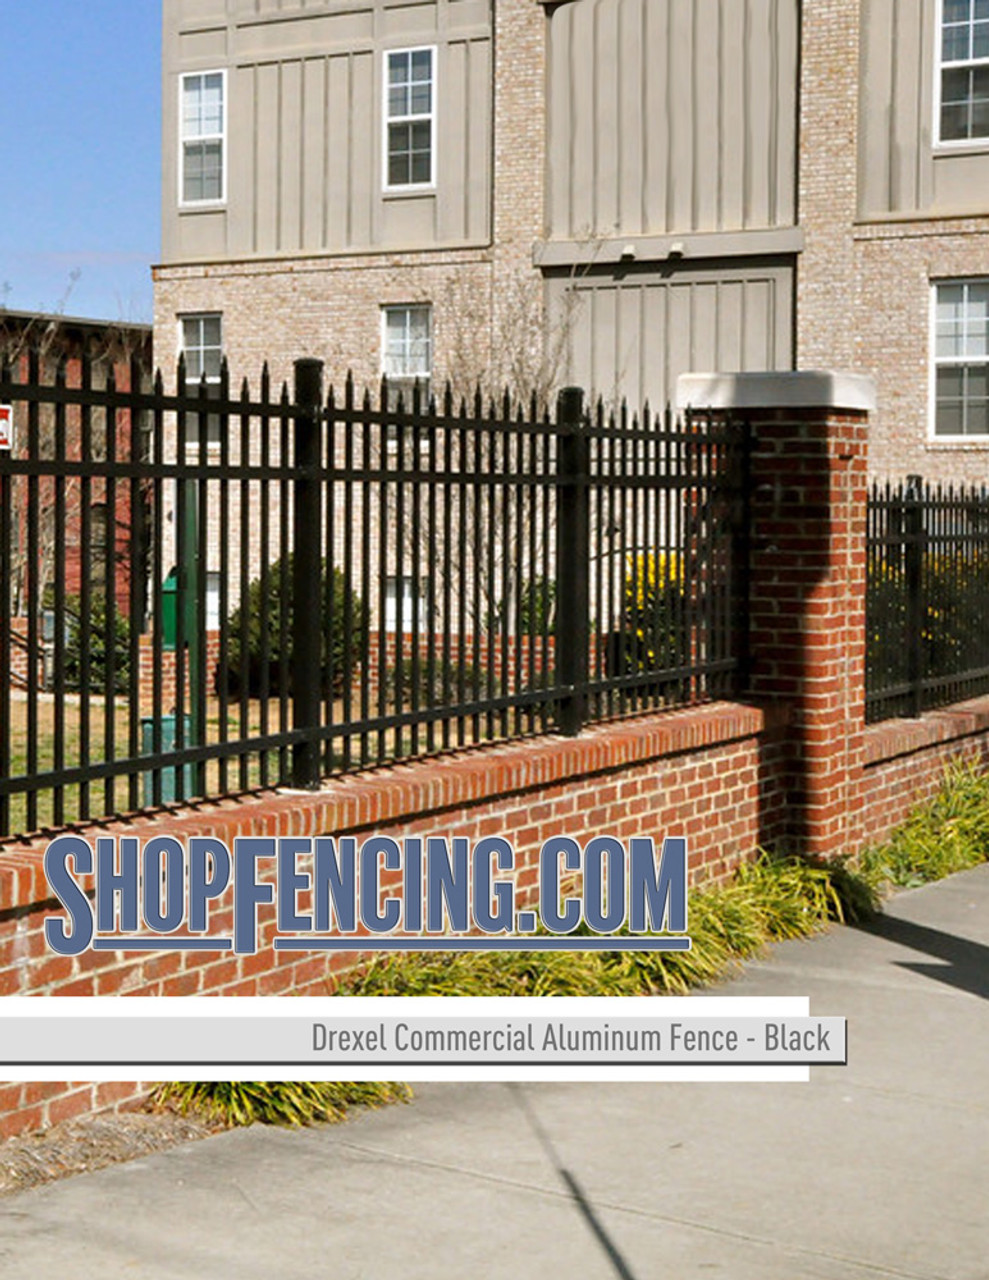 Black Commercial Drexel Aluminum Fencing From ShopFencing.com